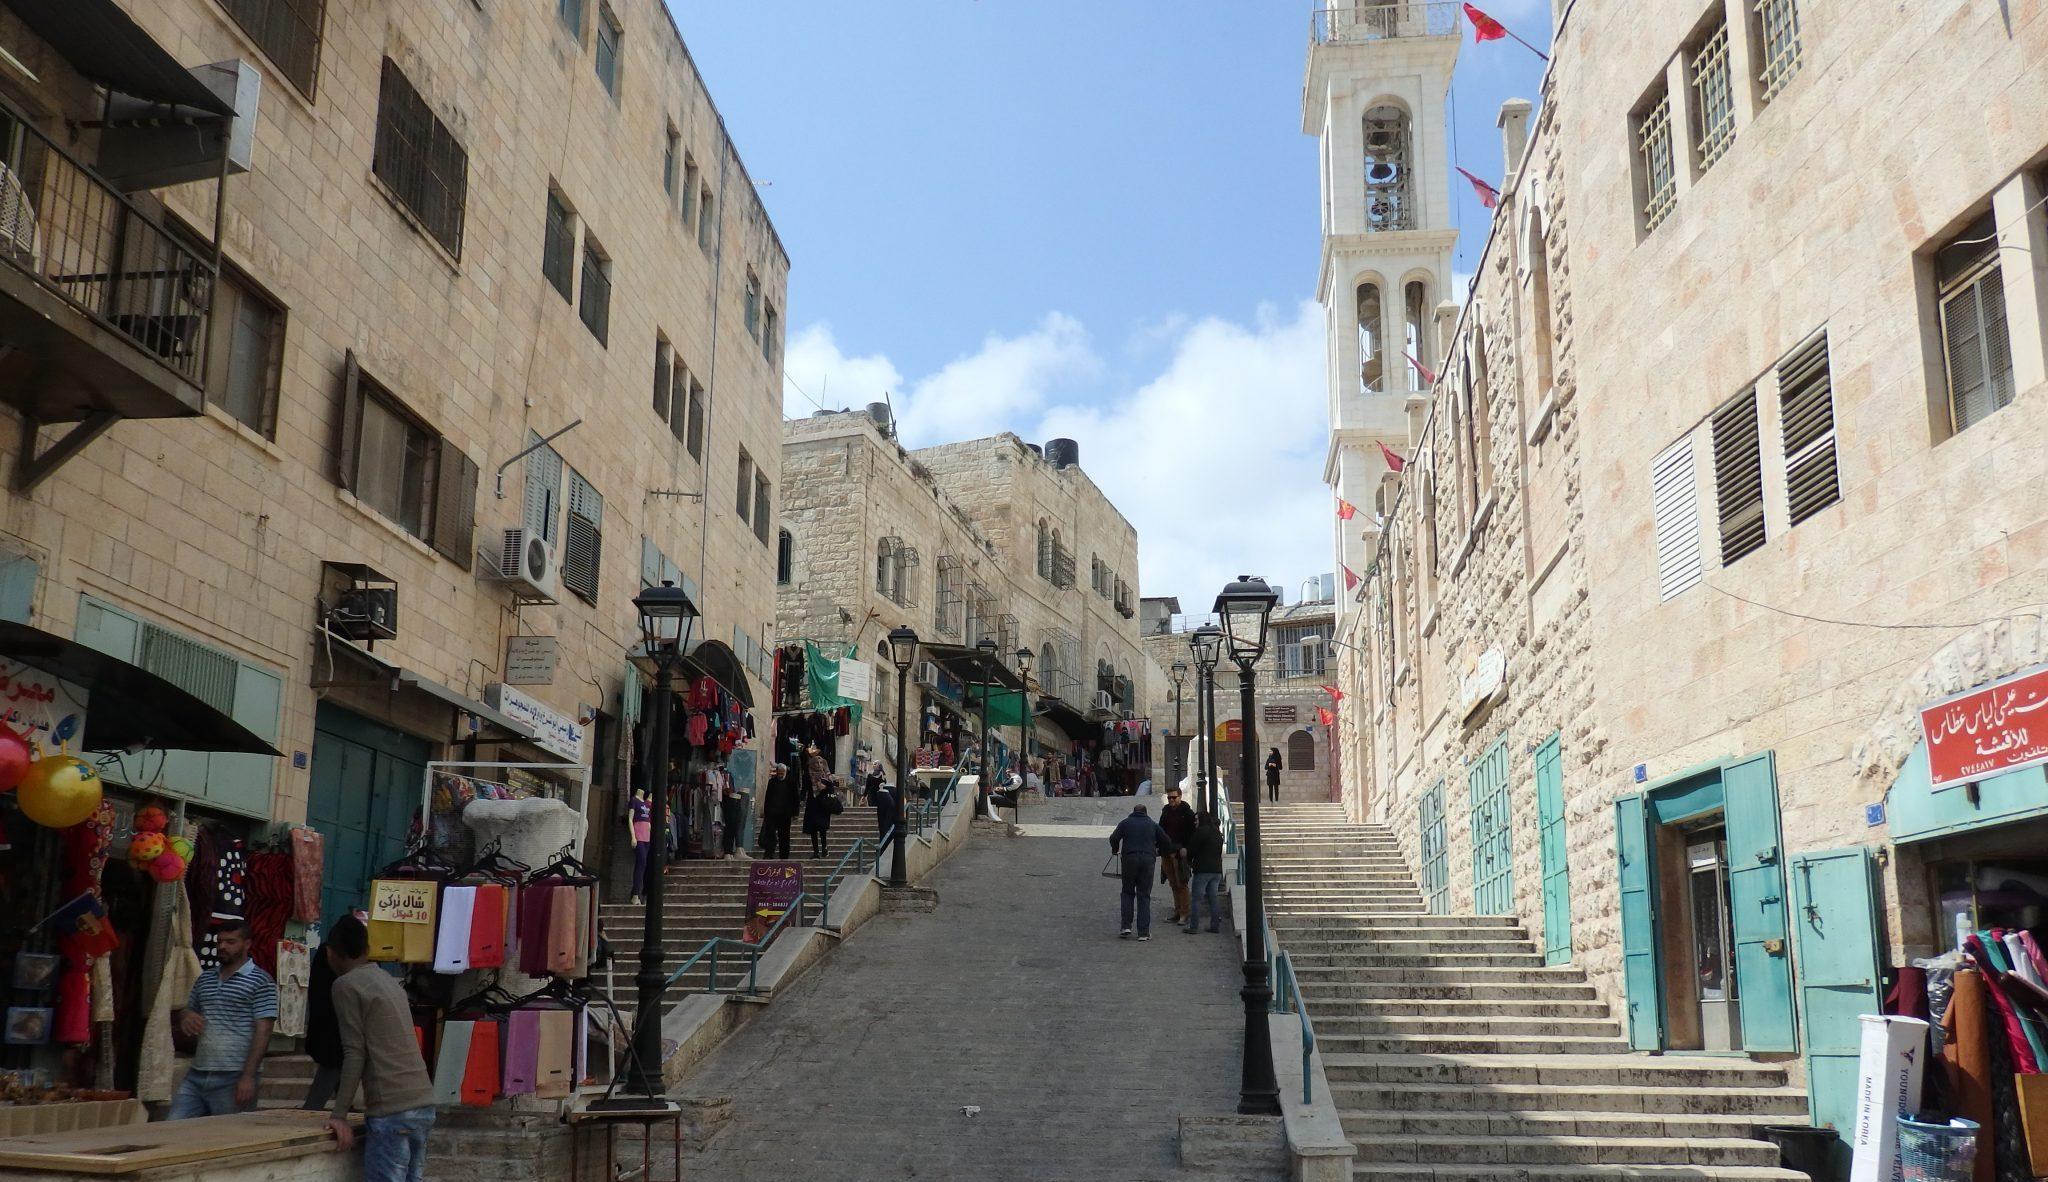 Visiting Bethlehem: a shopping street in the old city of Bethlehem